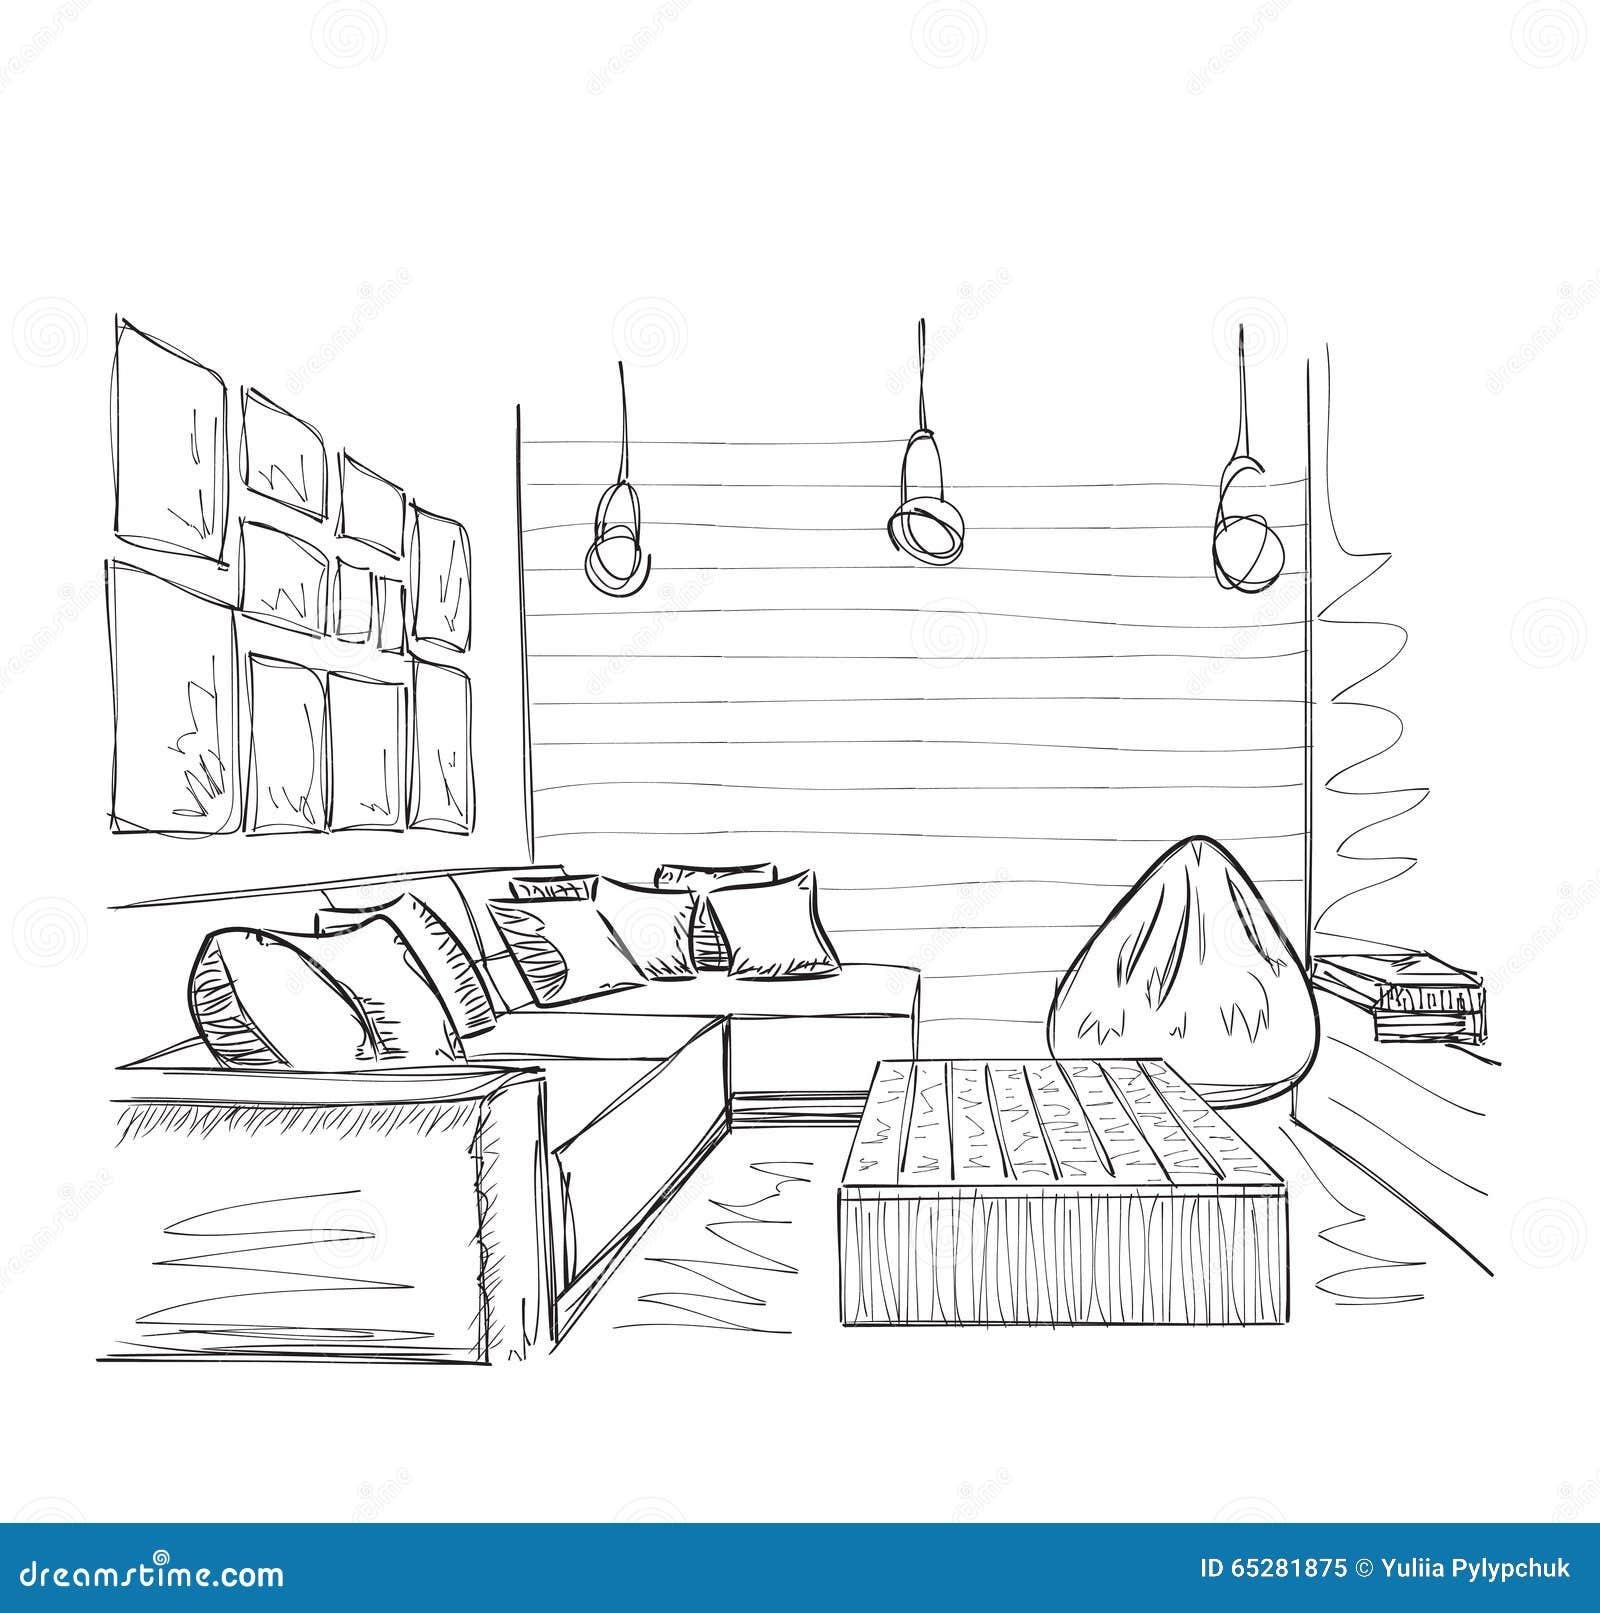 Modern Interior Room Sketch Hand Drawn Furniture Stock Vector